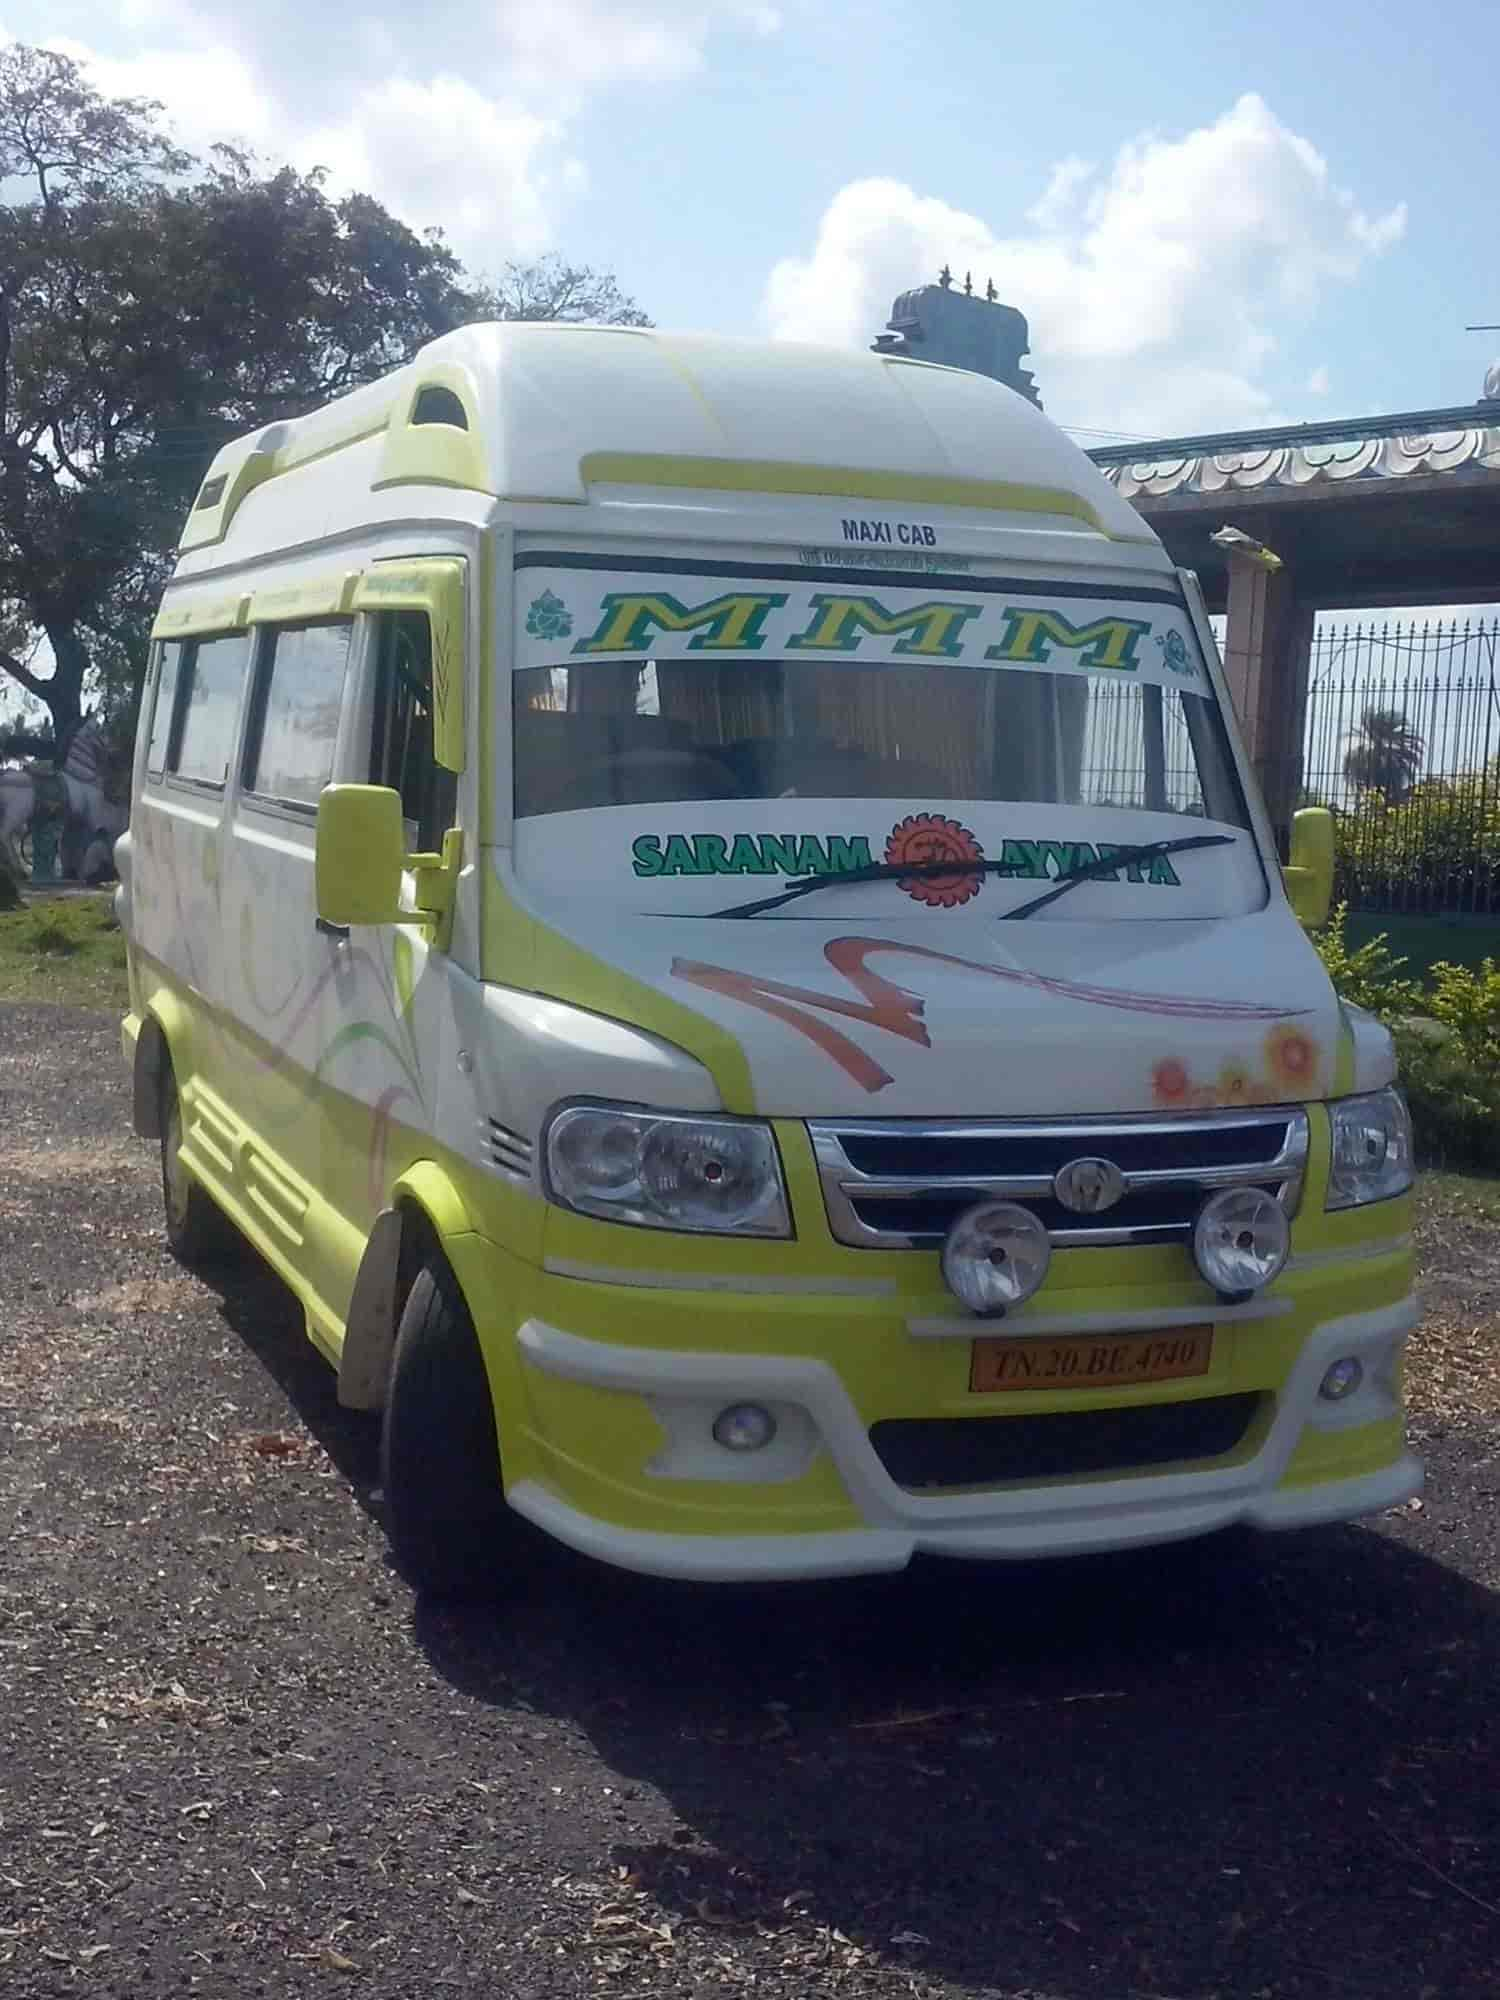 MMM Tourist & Travels, Perungudi - Car Hire in Chennai - Justdial